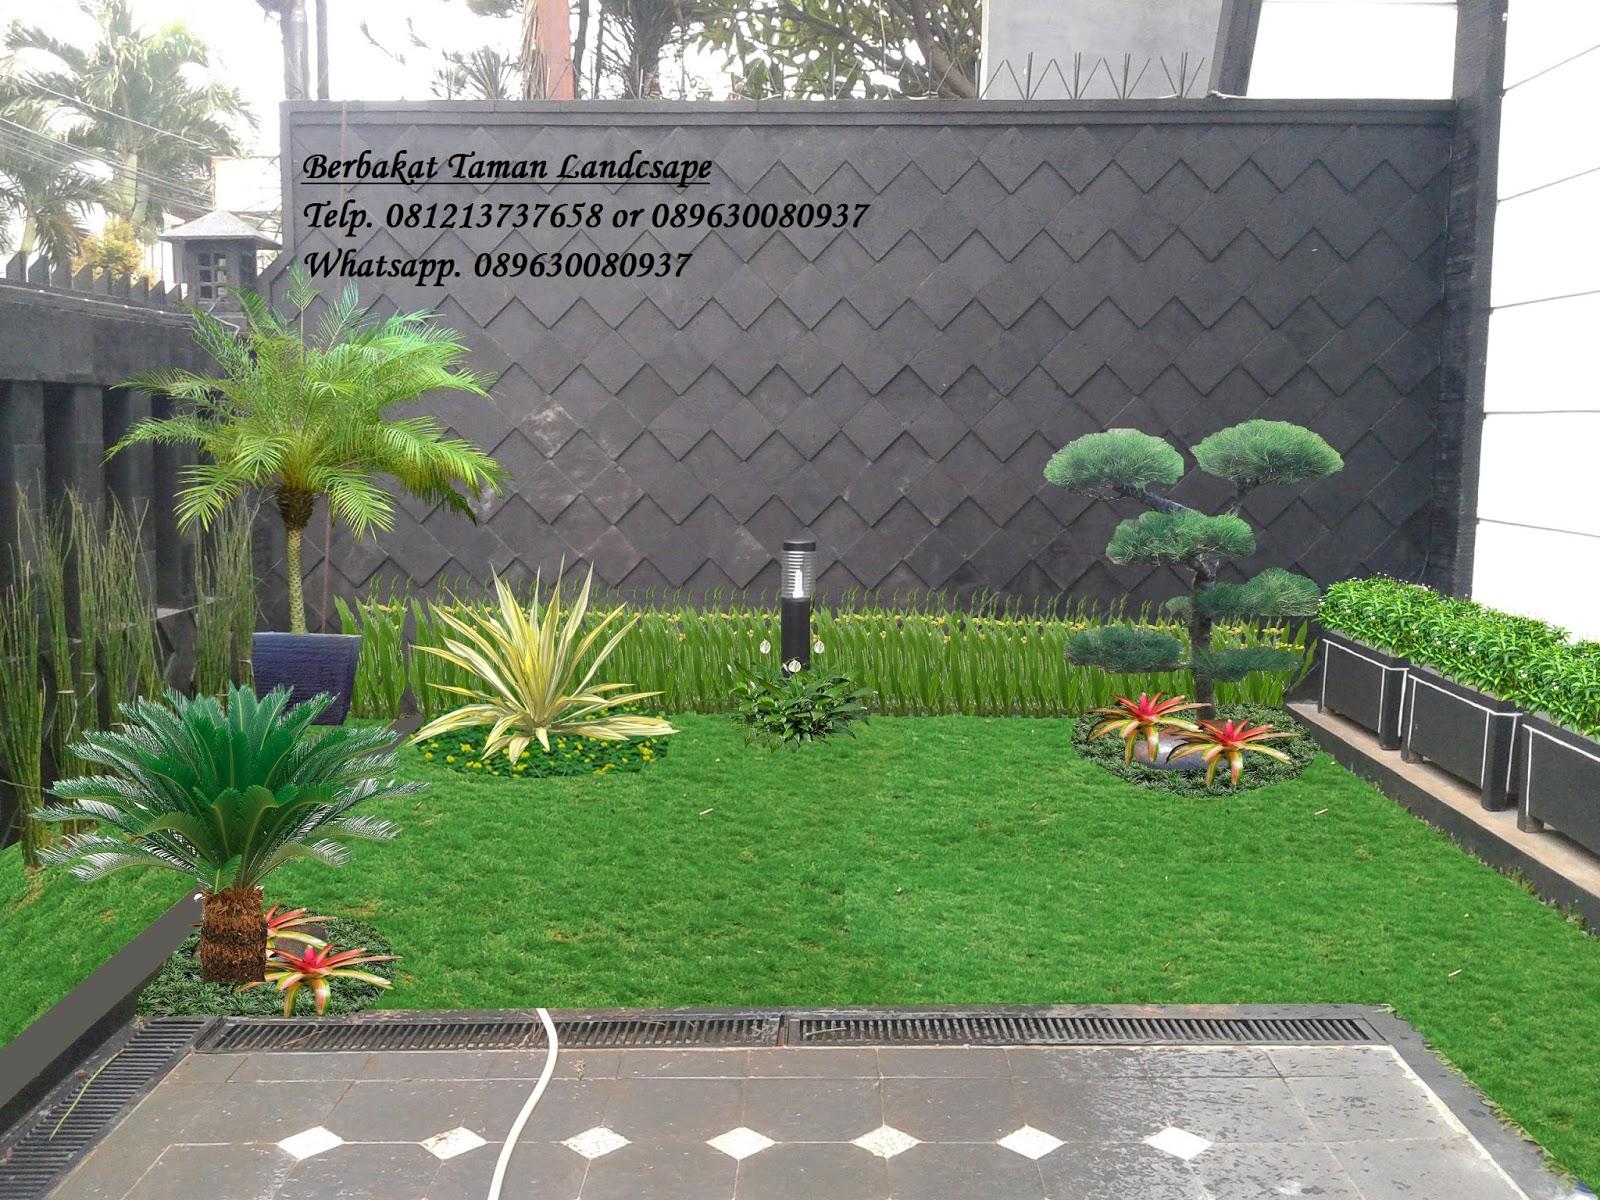 Tukang Pembuat Taman Minimalis Di Sentul City Berbakat Taman